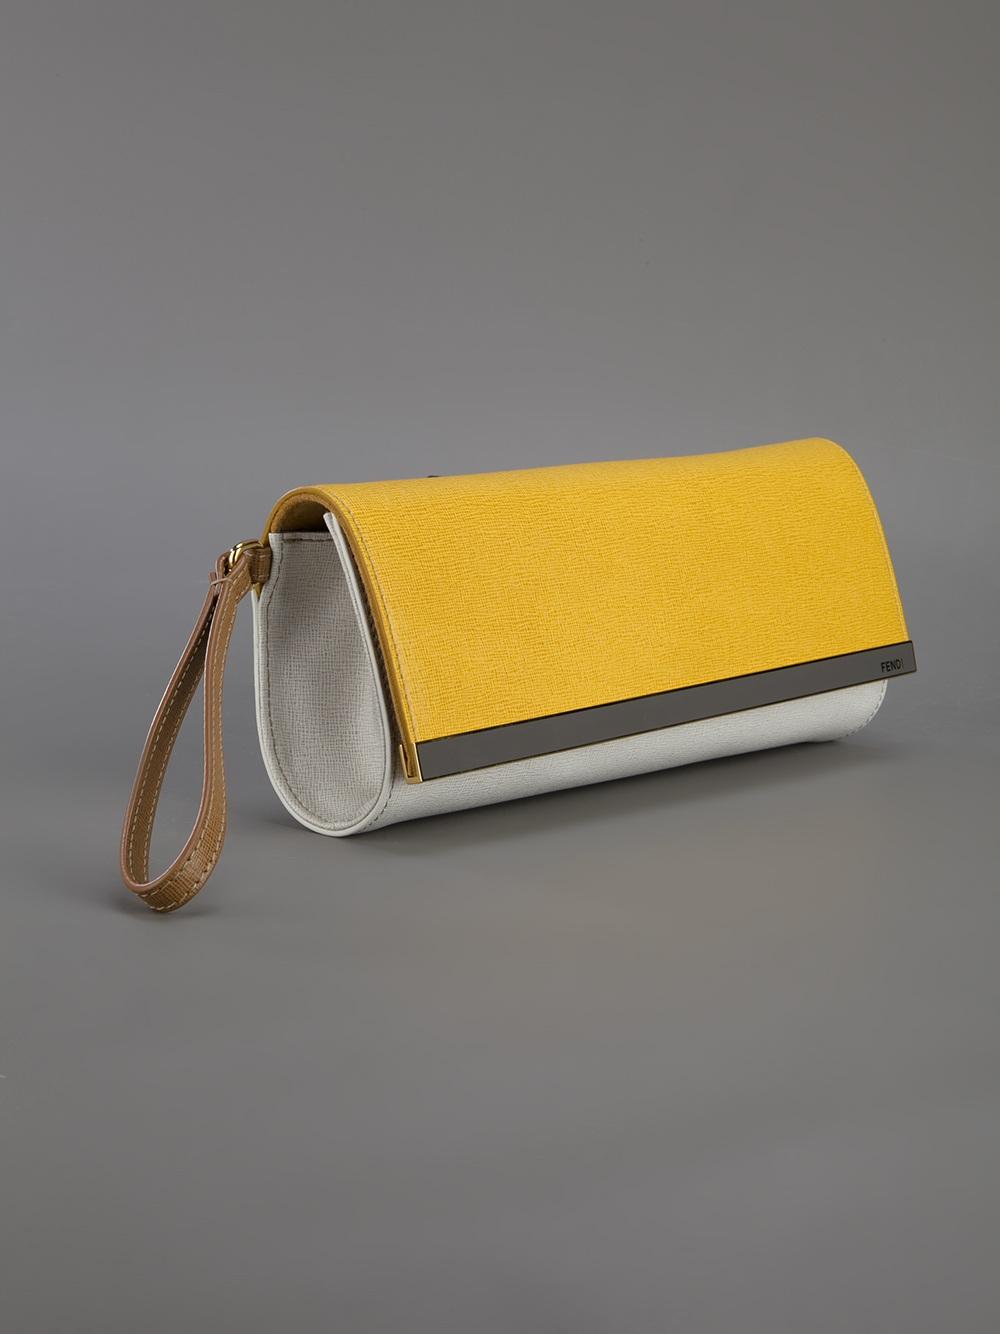 Fendi Clutch Yellow